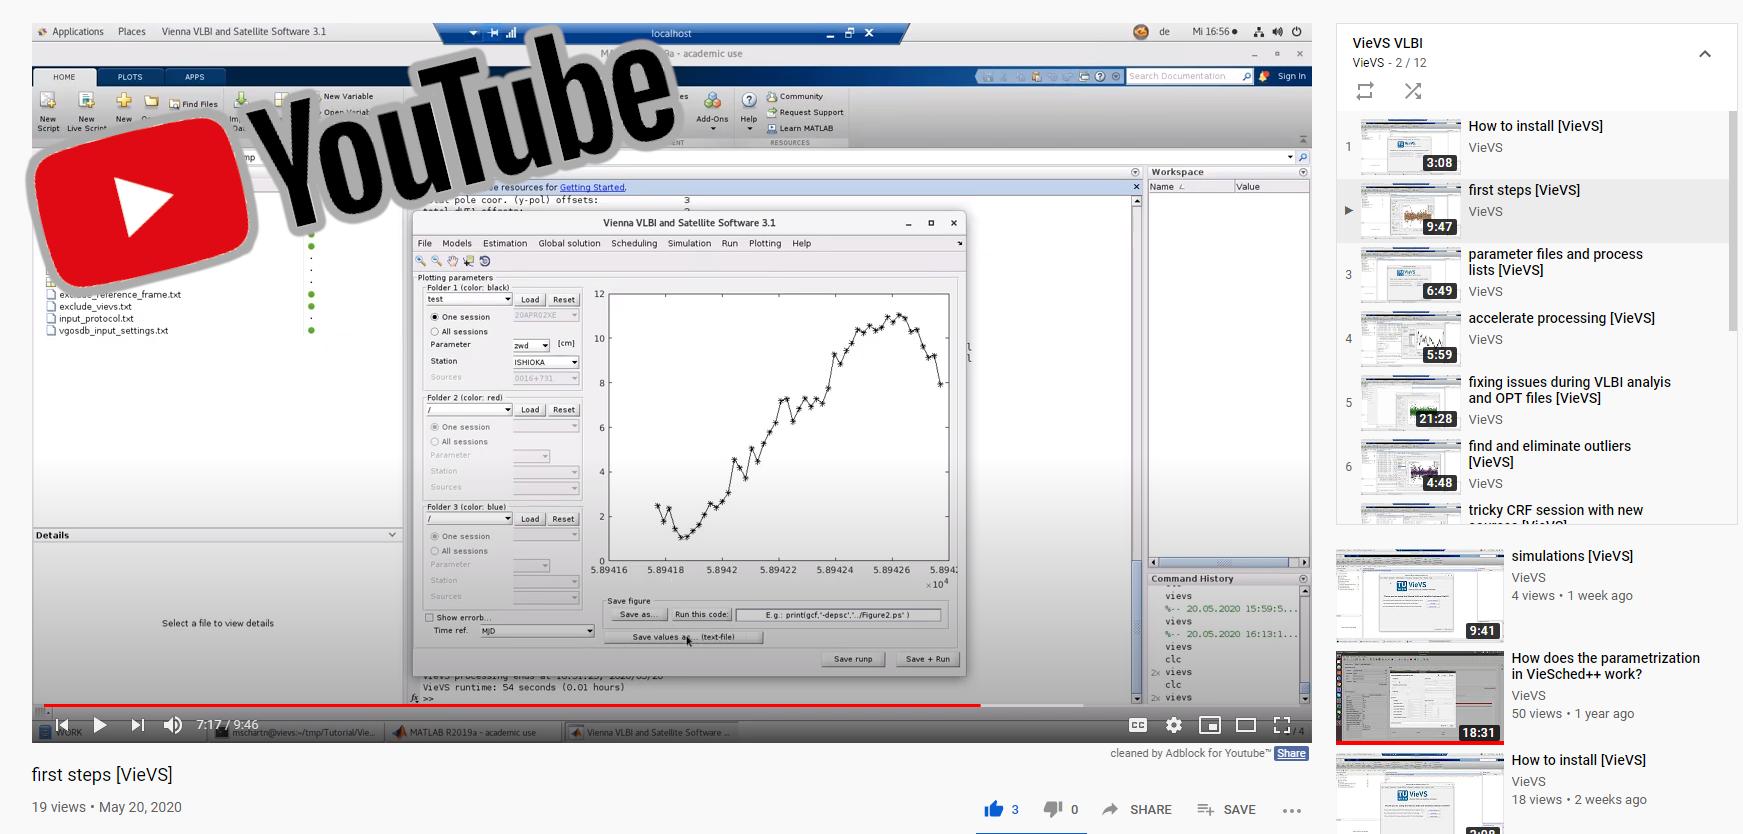 VieVS YouTube tutorials online